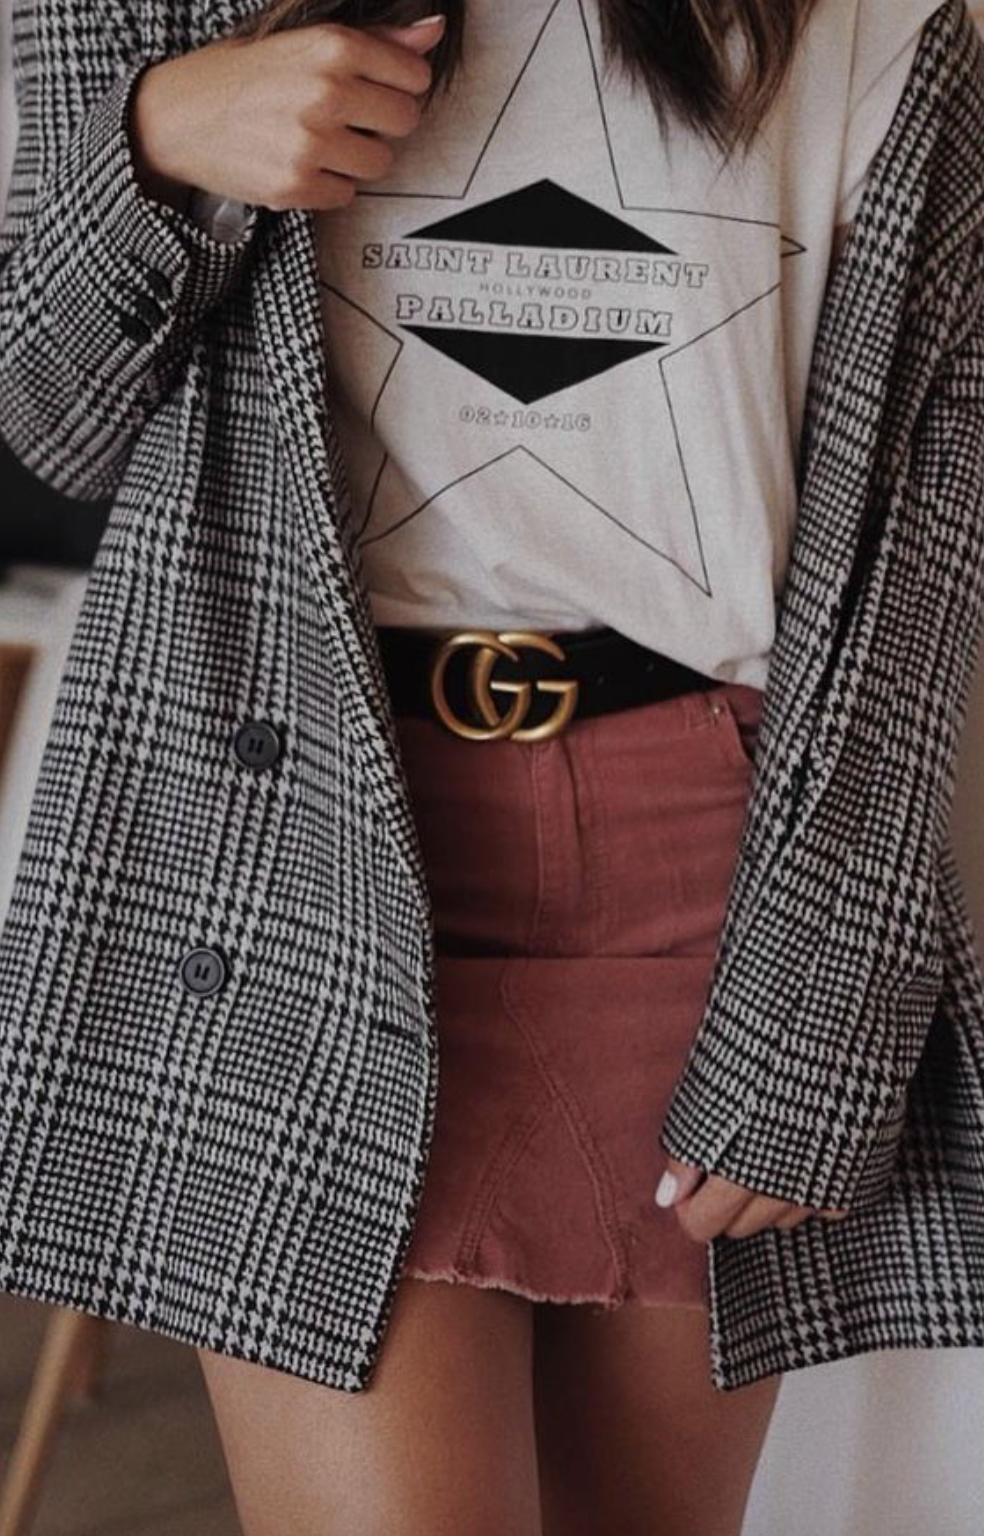 saint laurent graphic tee + gucci belt outfit + corduroy mini skirt + plaid  blazer jacket cb8f9554e1bc